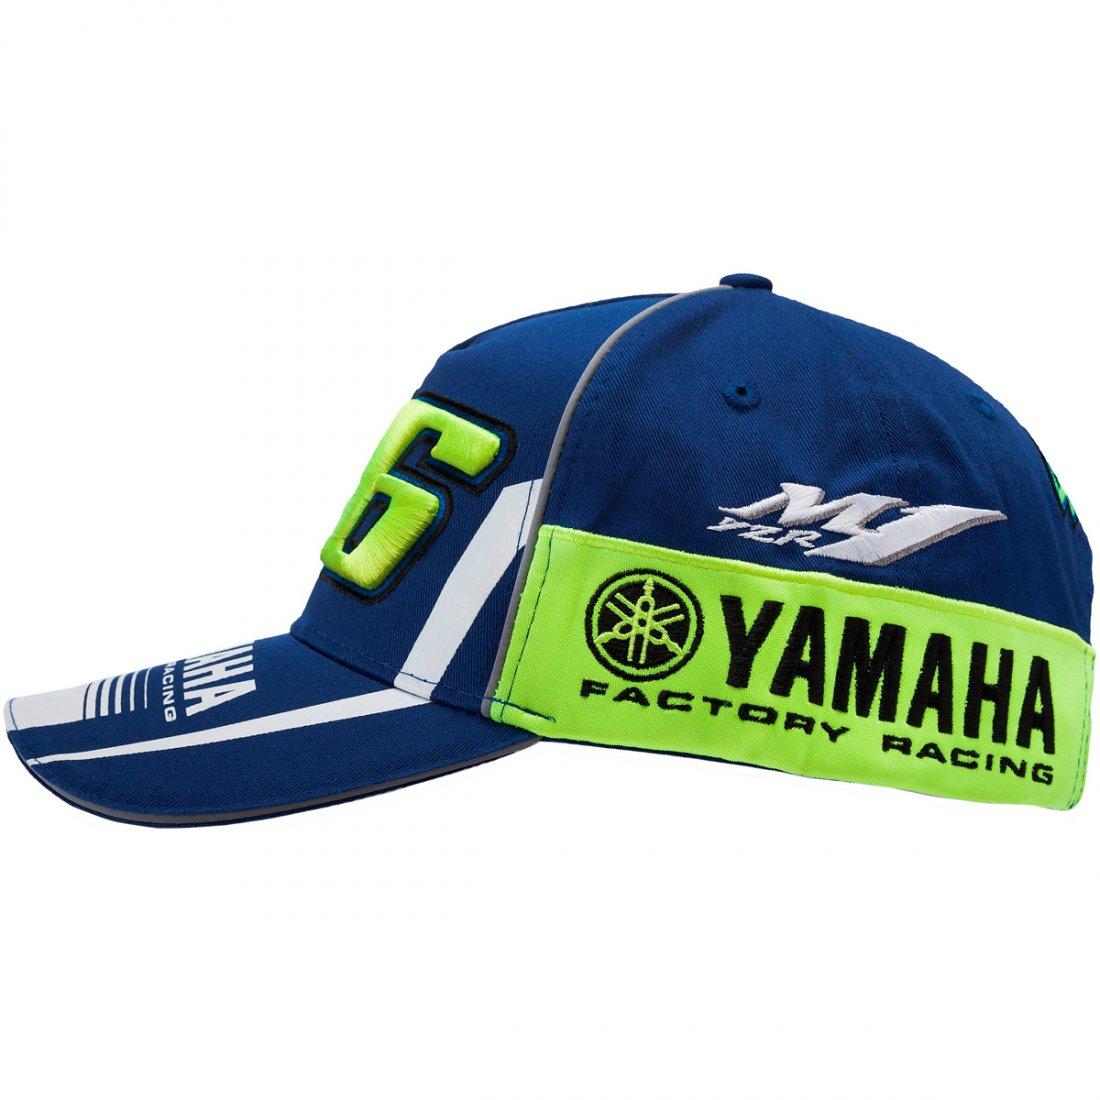 VR46 Yamaha Rossi VR 46 272909 Cap · Motocard 08d5565e0ae